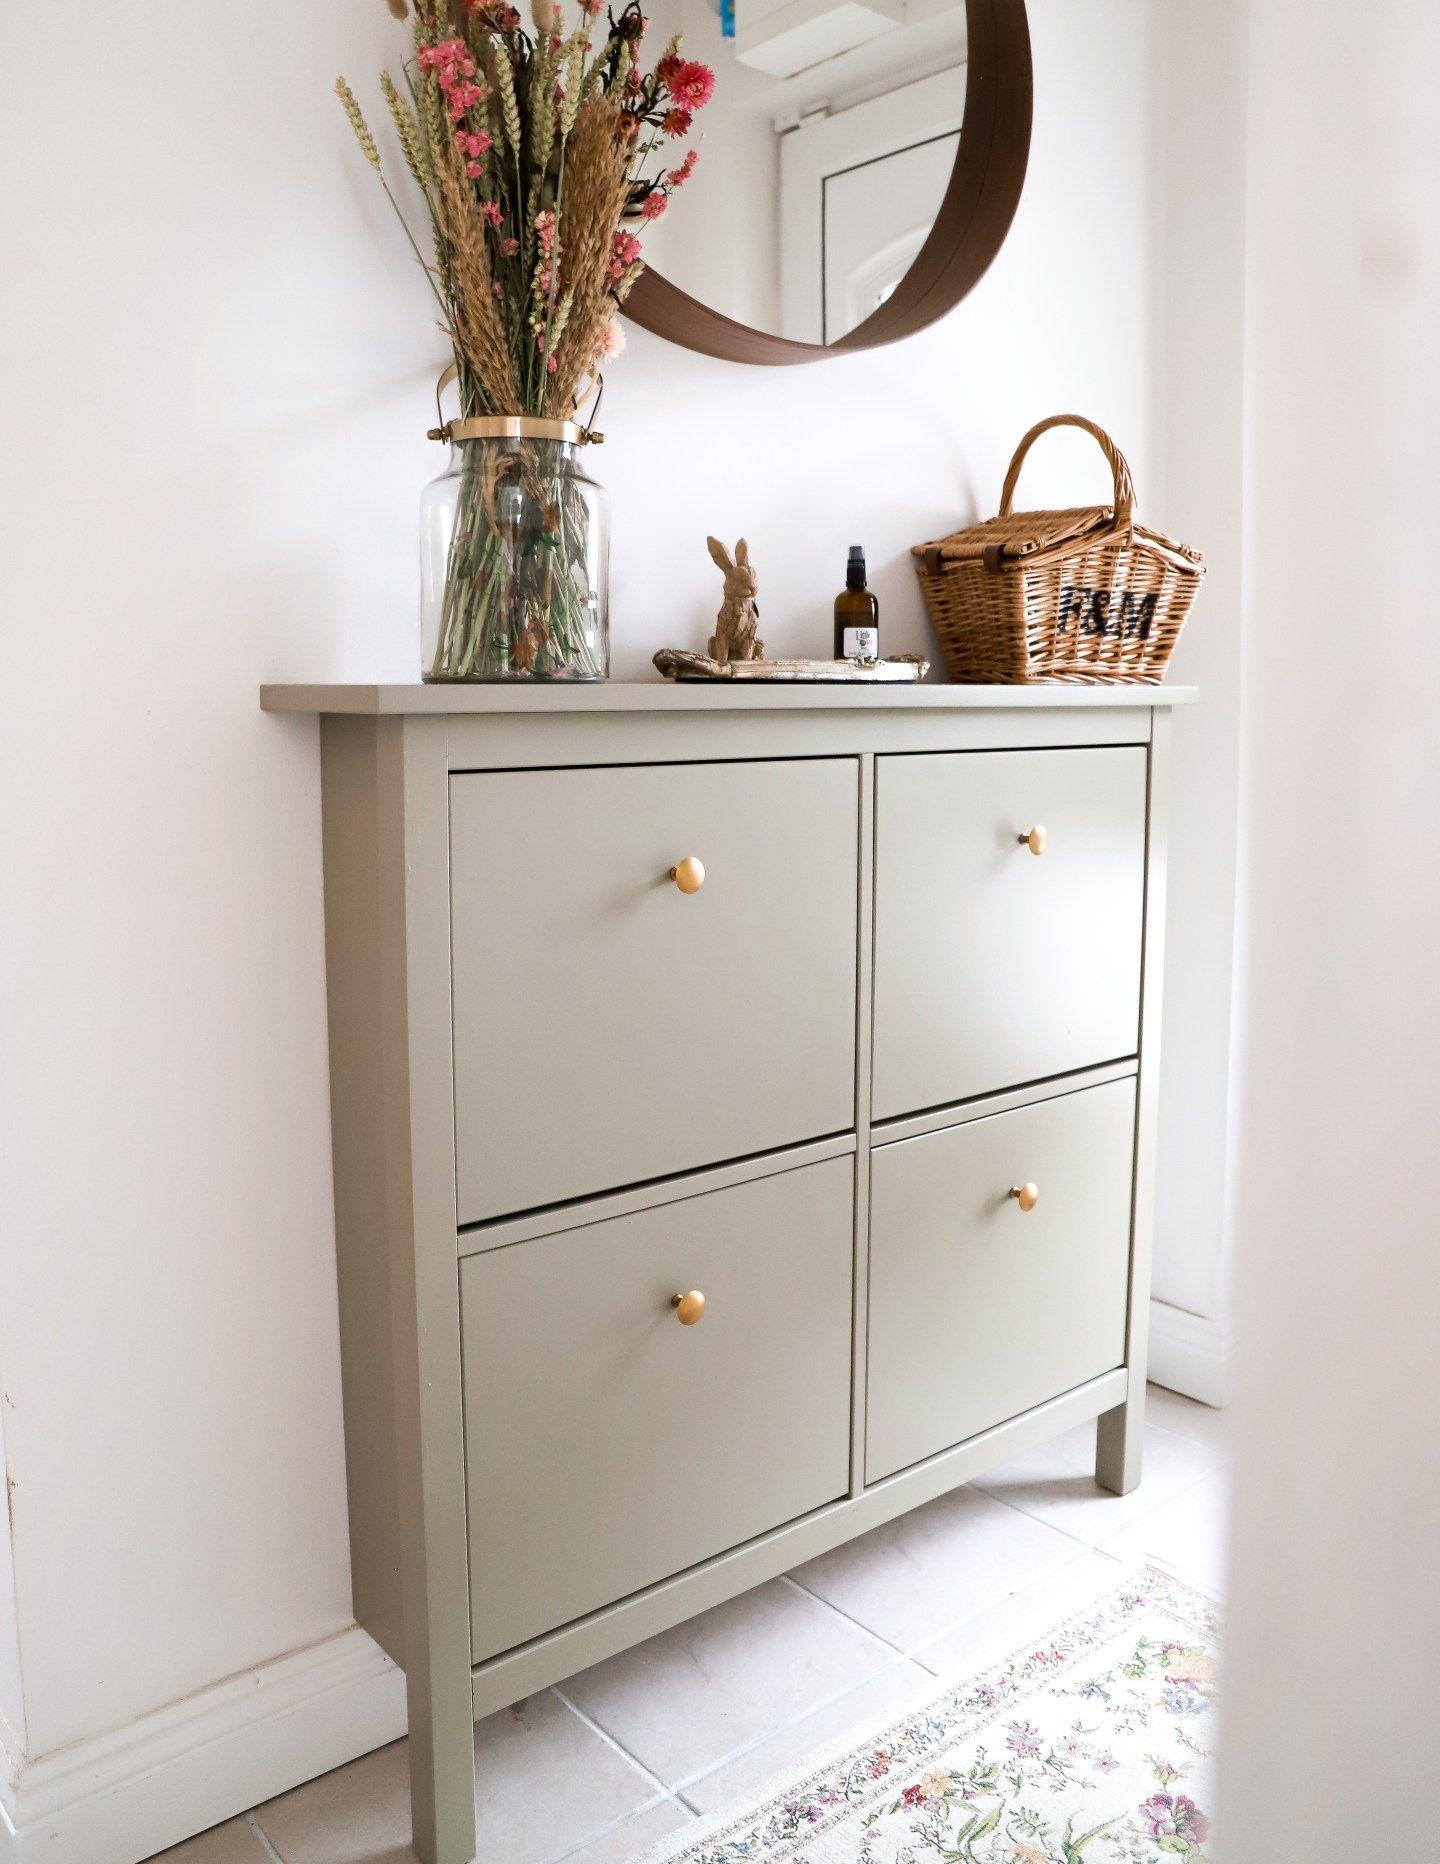 Boho Ikea Hemnes Shoe Cabinet Makeover